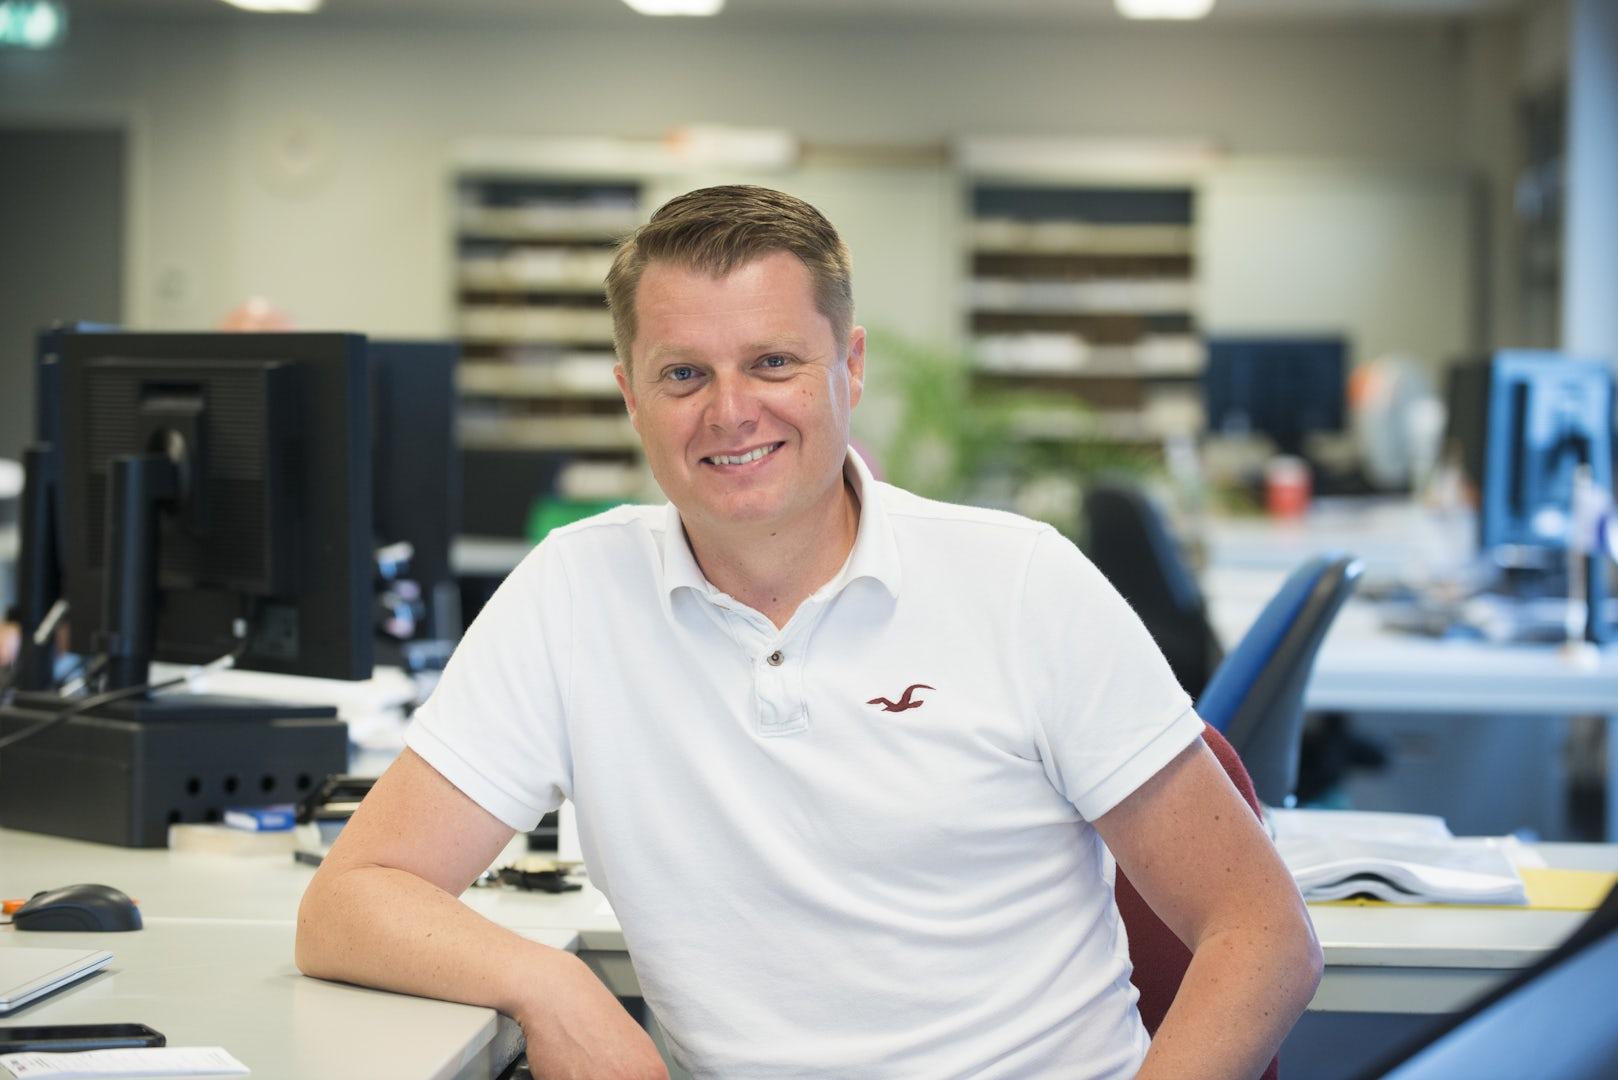 Jacek Siminiak Sales Accountmanager Hotraco Agri portret DSC 8201